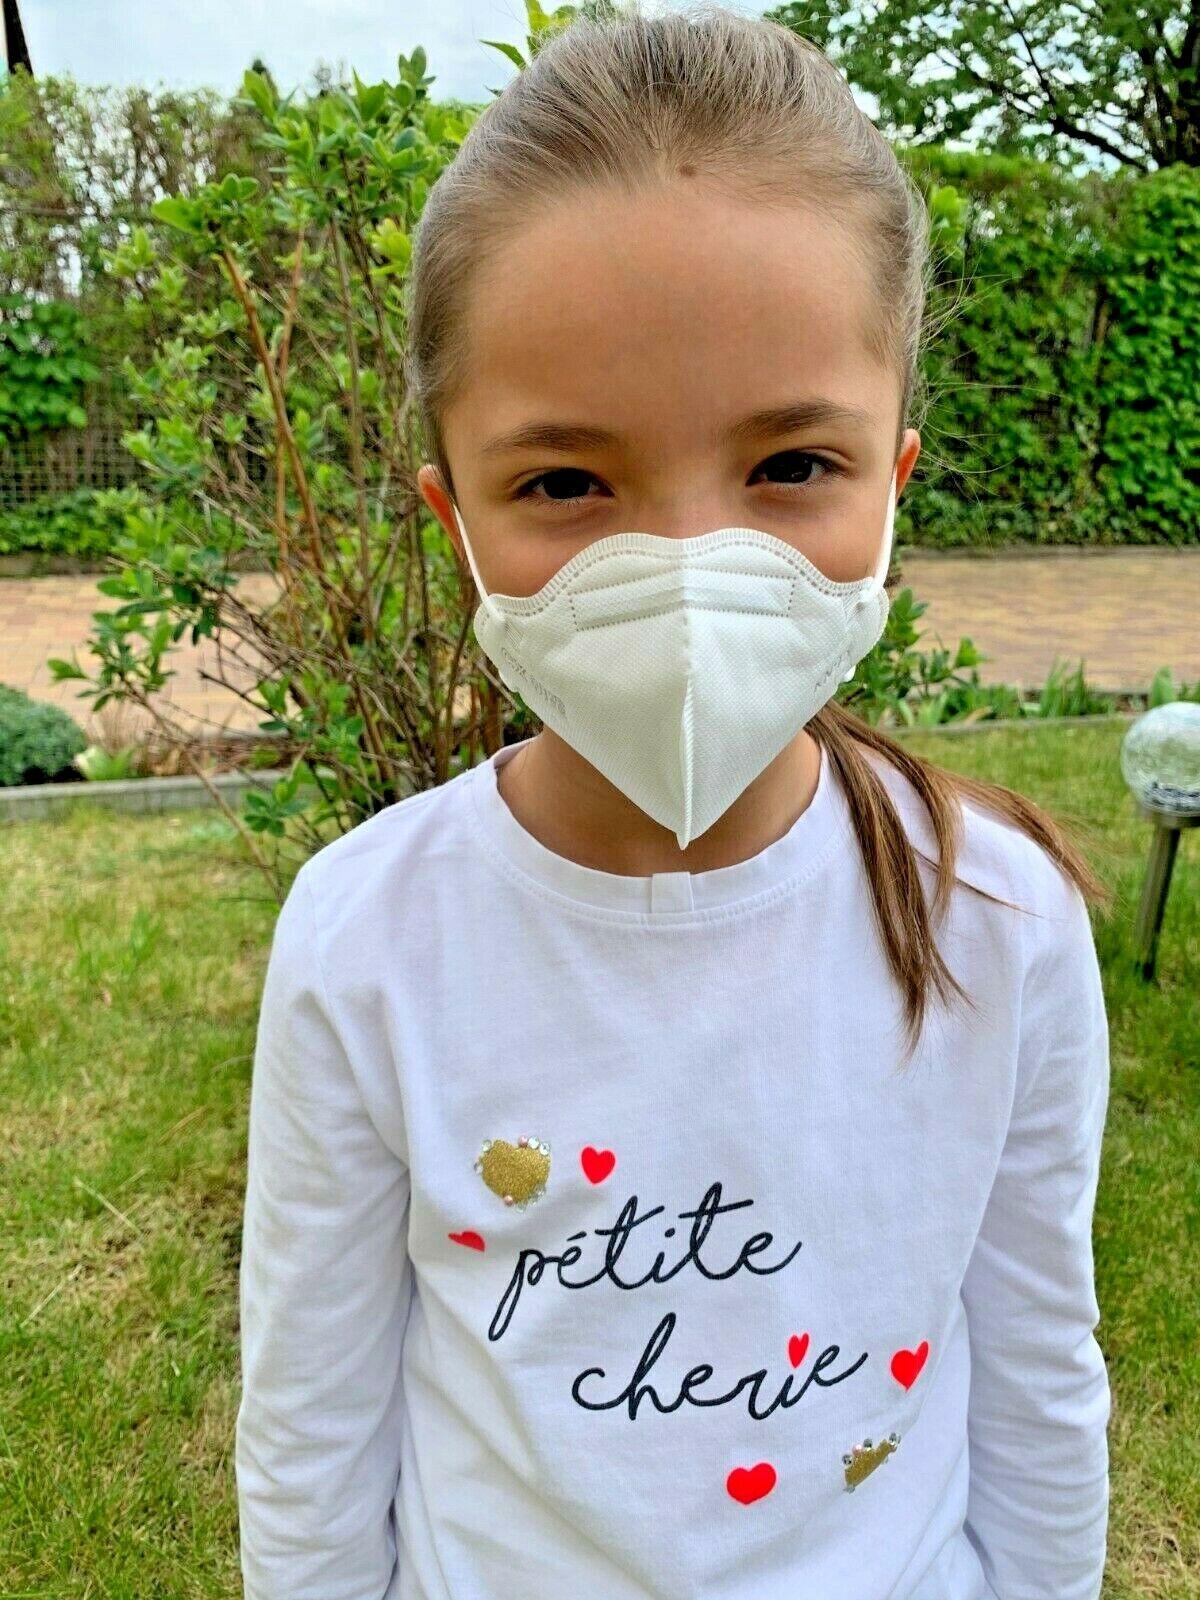 FFP2 KN95 Kinder Mundschutz Atem Maske Schutzmaske MundNase 1-5-10Stk AKTION NEU